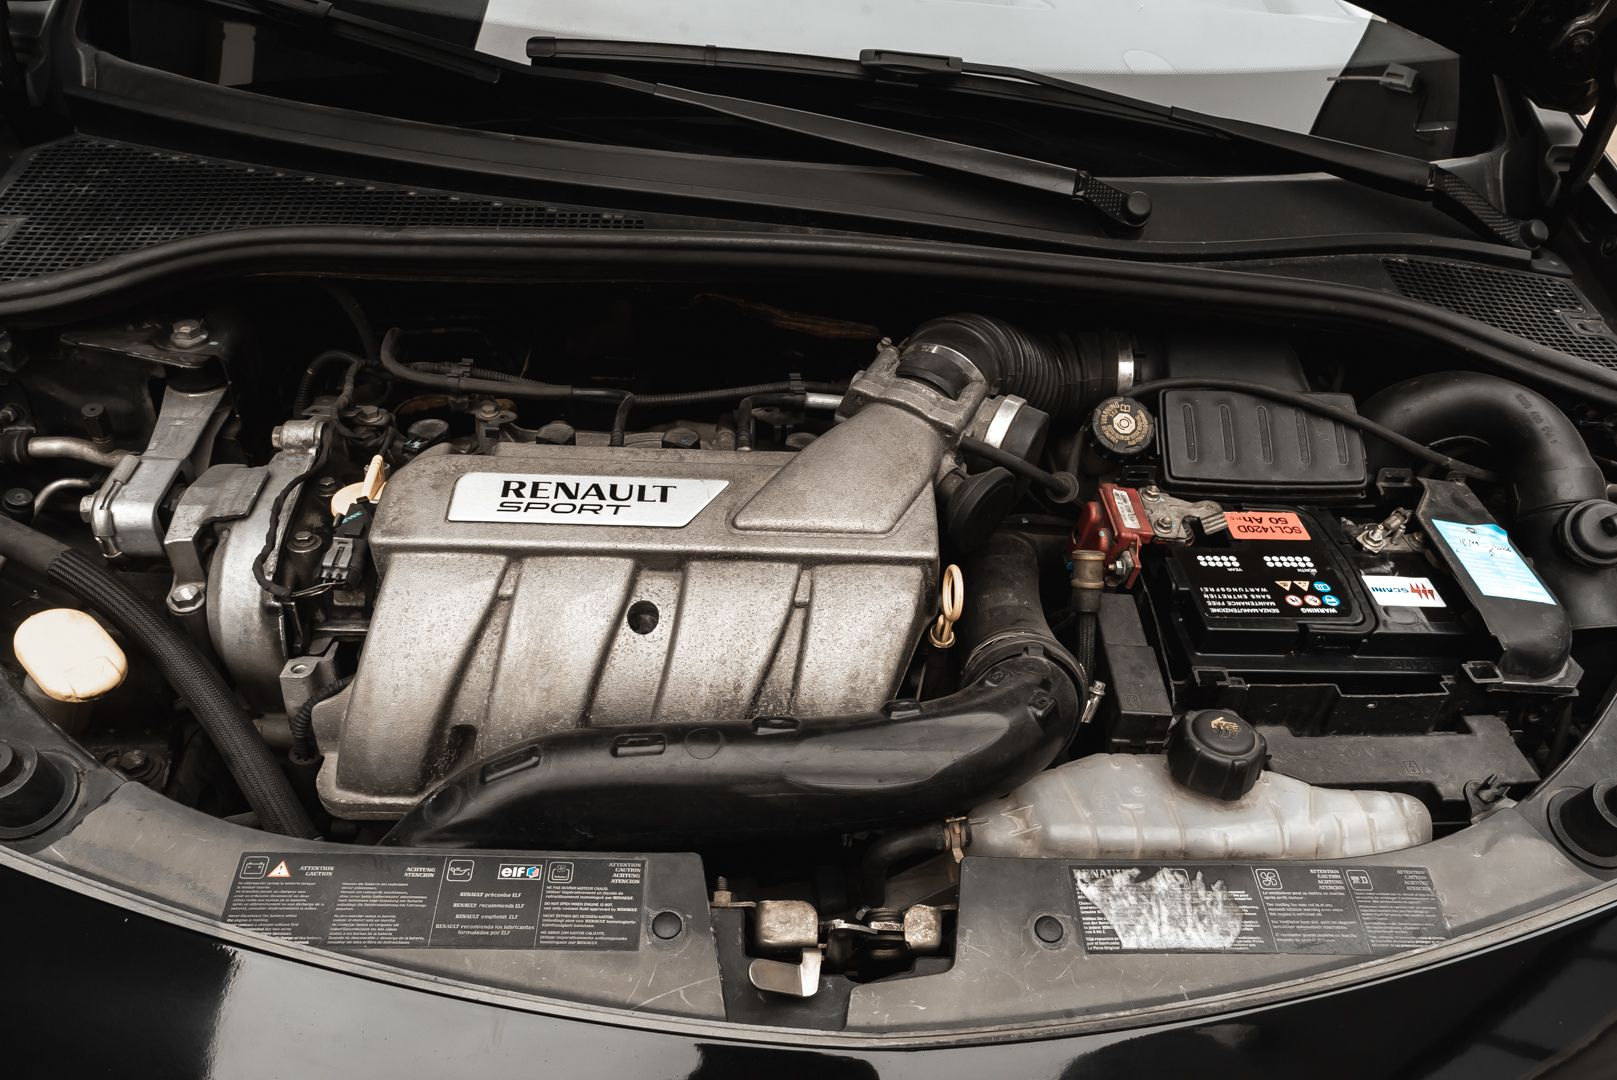 2006 Renault Clio 2.0 RS 81133